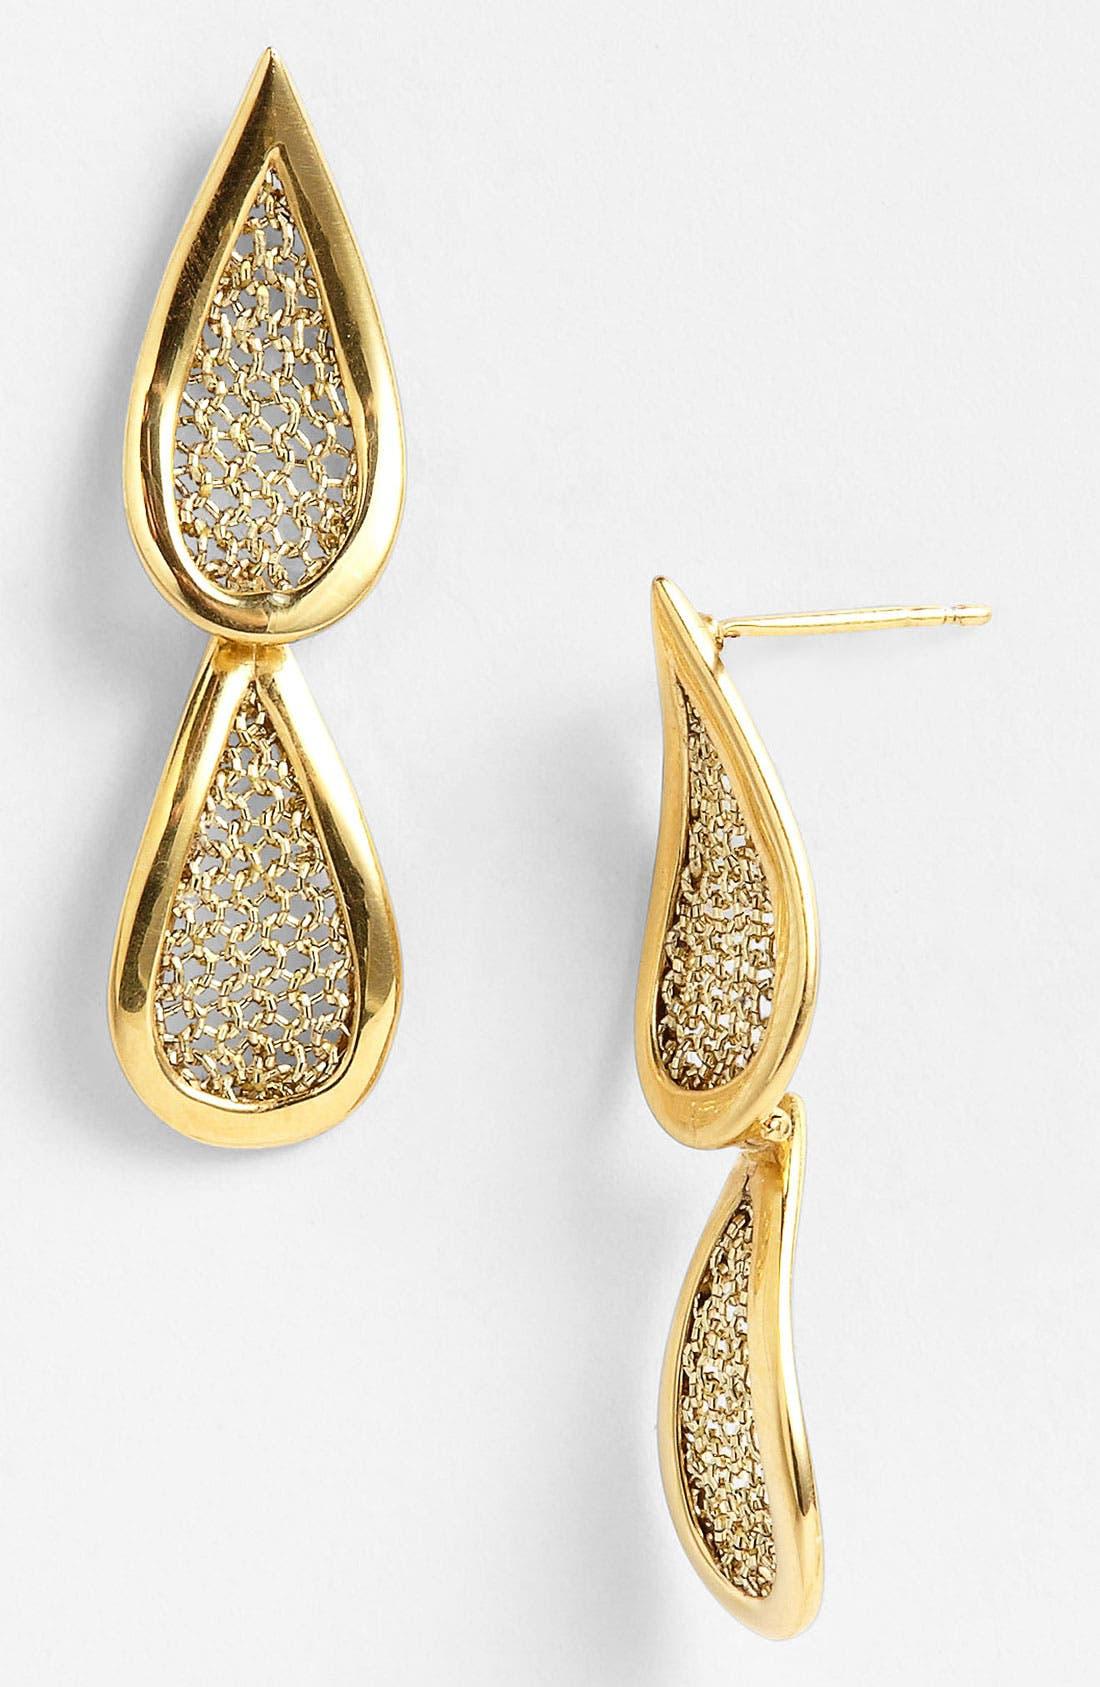 Alternate Image 1 Selected - Adami & Martucci 'Mesh' Drop Earrings (Nordstrom Exclusive)